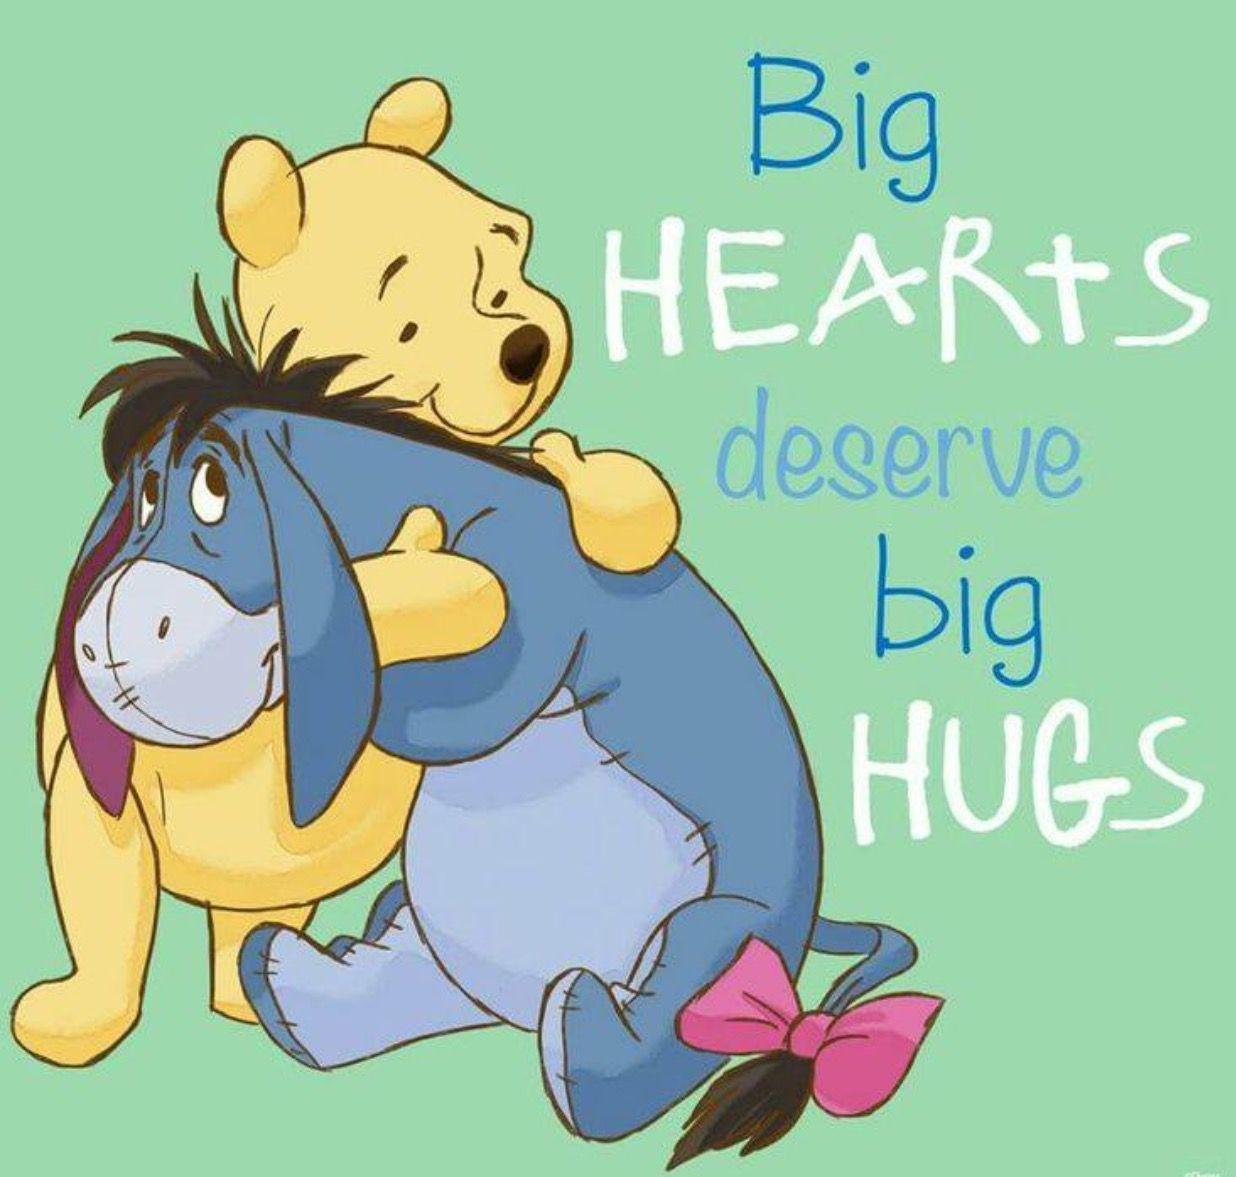 Sending you a big hug, my dear. You are my dearest friend ...